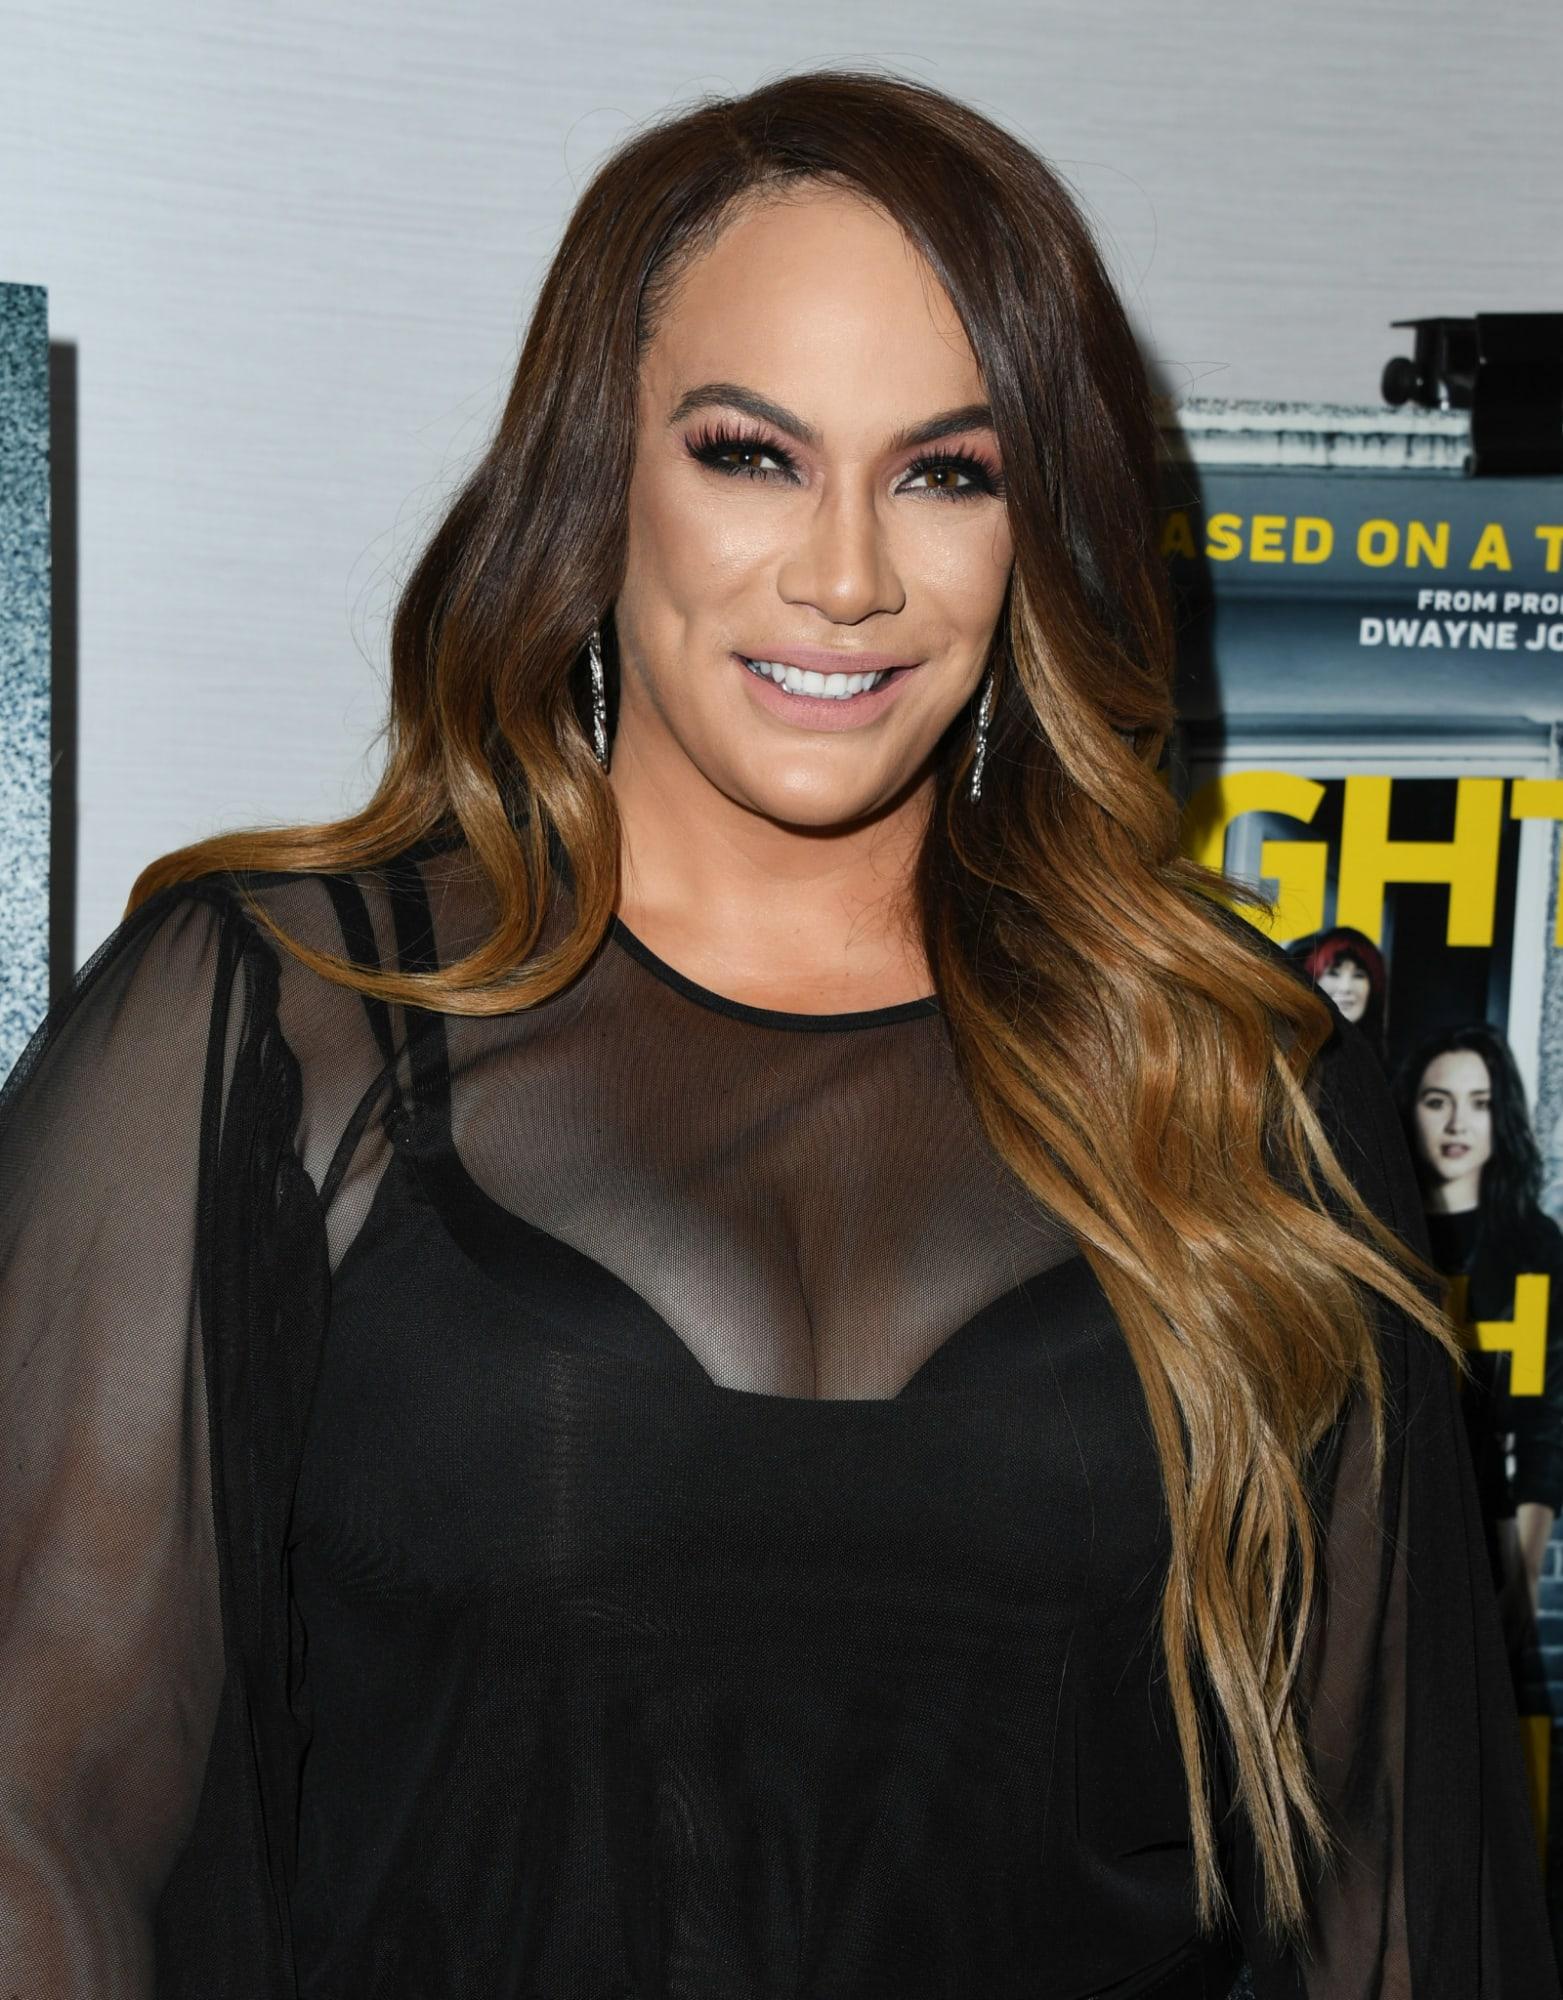 Nia Jax shoots down injury rumors | Wrestling News